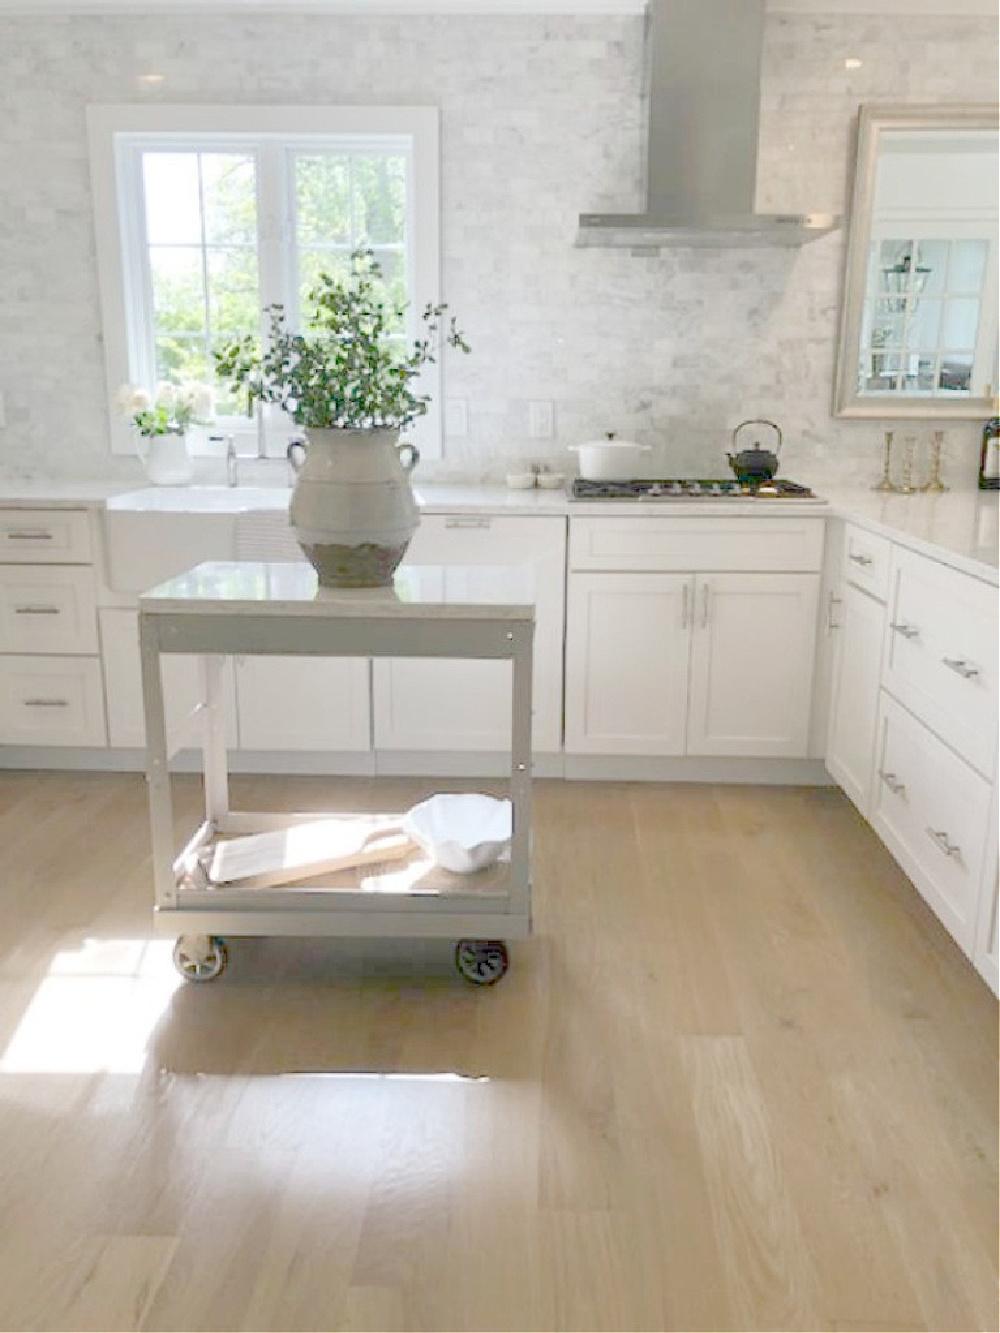 White oak hardwood floors in a serene simple Shaker modern farmhouse kitchen by Hello Lovely Studio. #hellolovelystudio #whiteoak #hardwoodfloors #kitchendesign #shakerkitchen